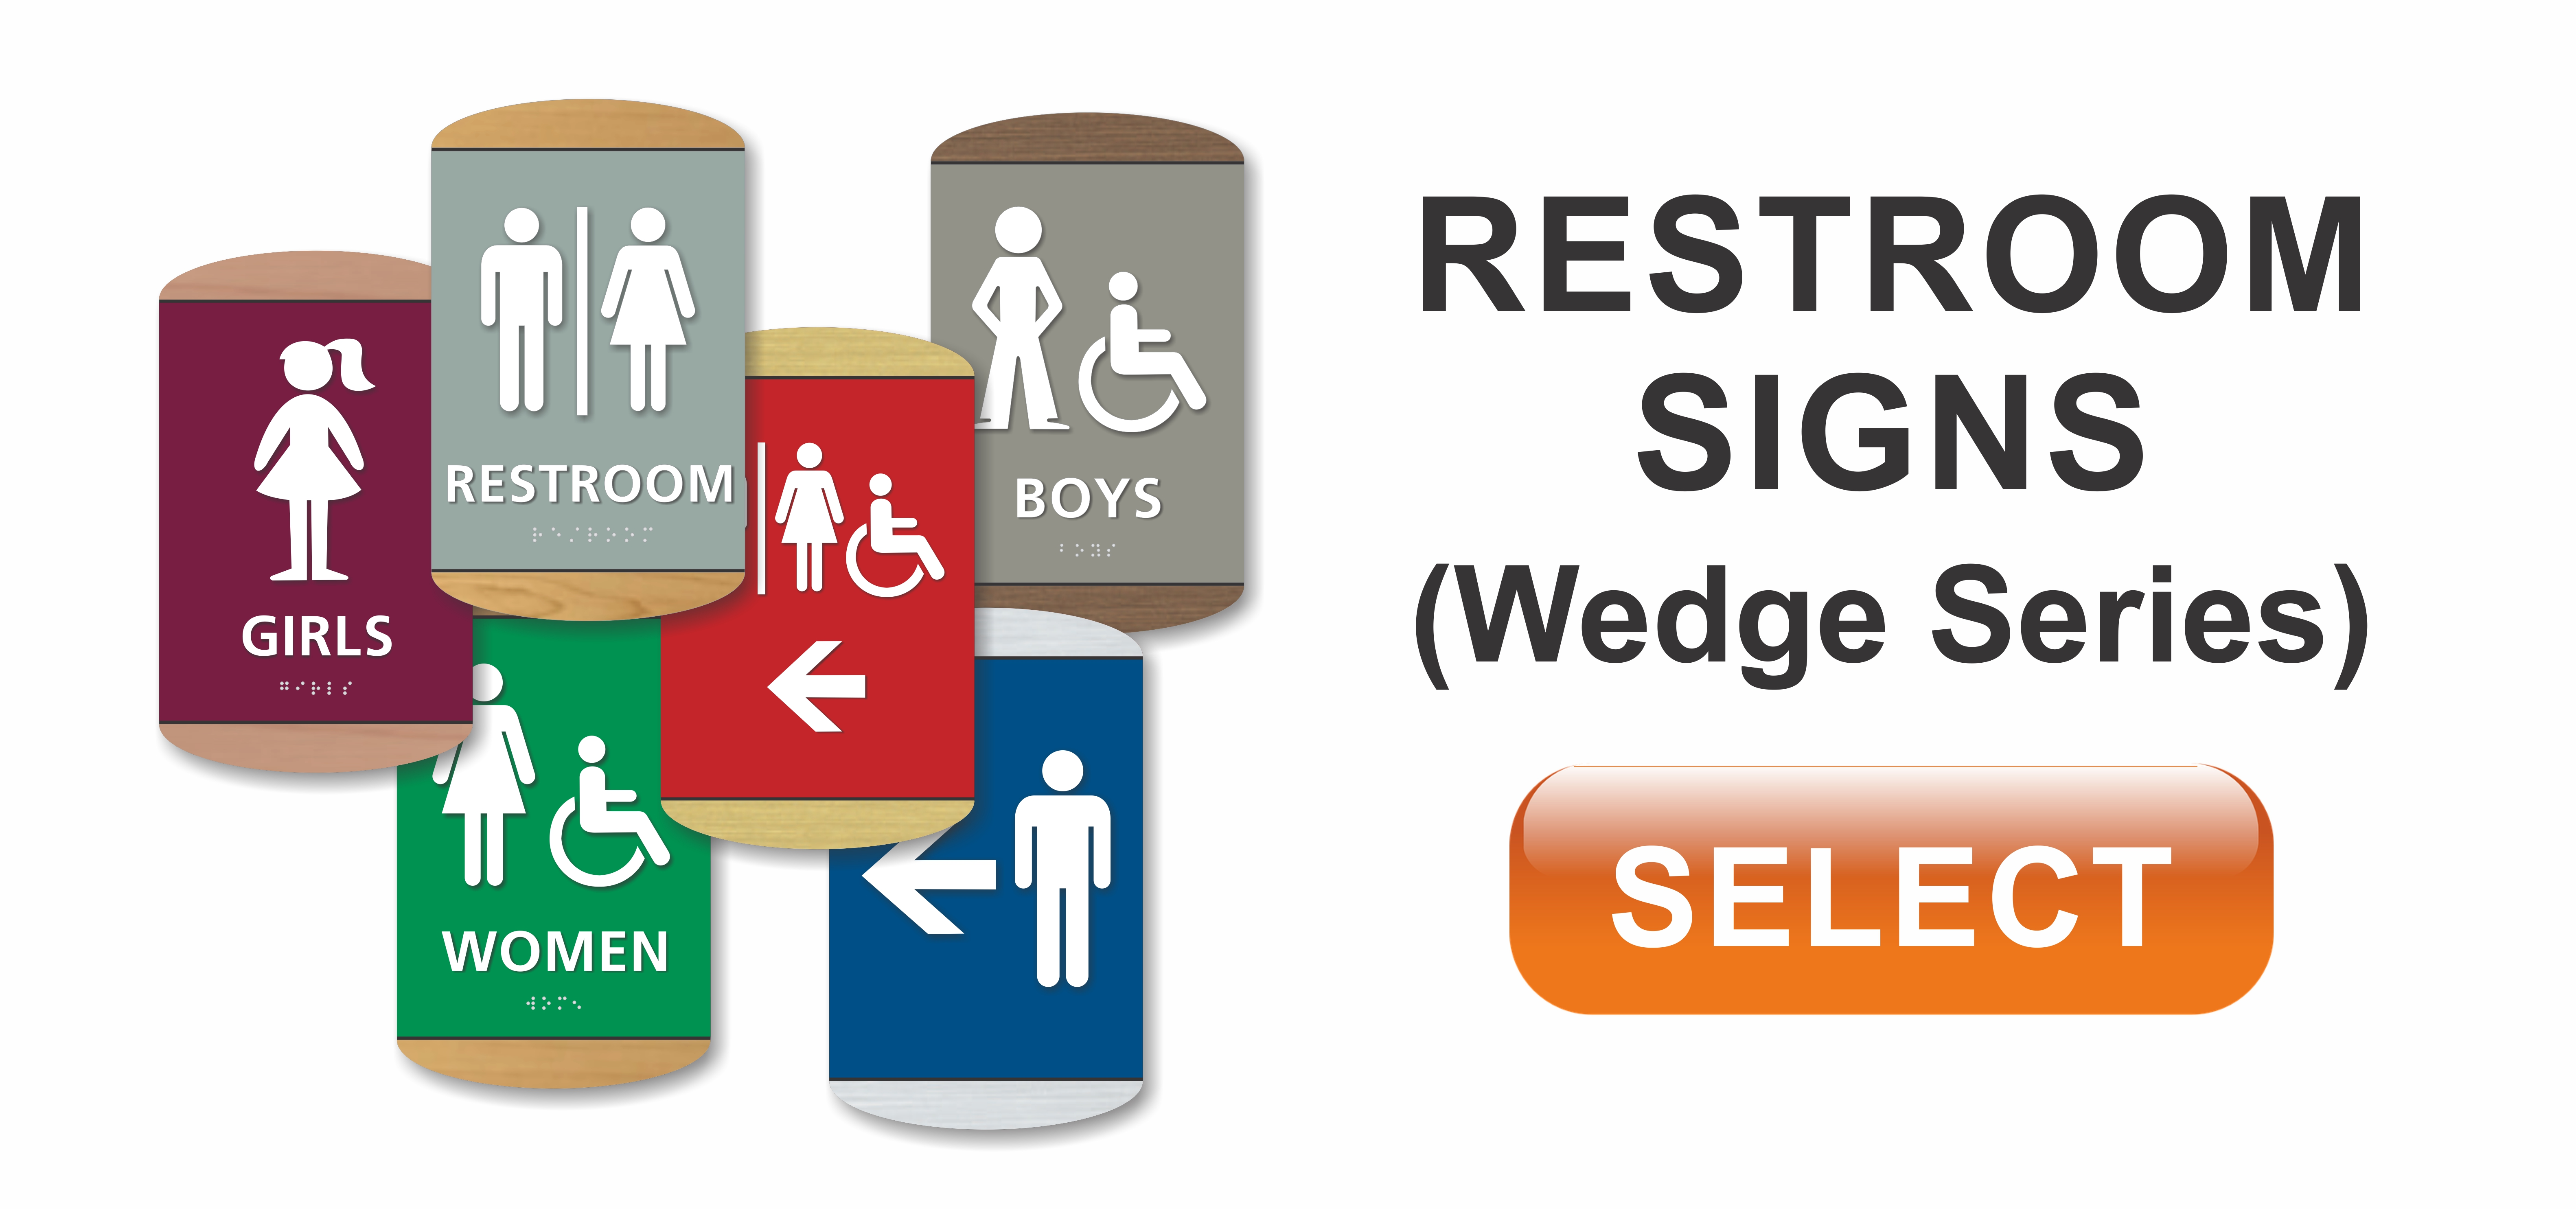 home decor bathroom signs.htm wedge custom ada braille signs modern interior building signage  wedge custom ada braille signs modern